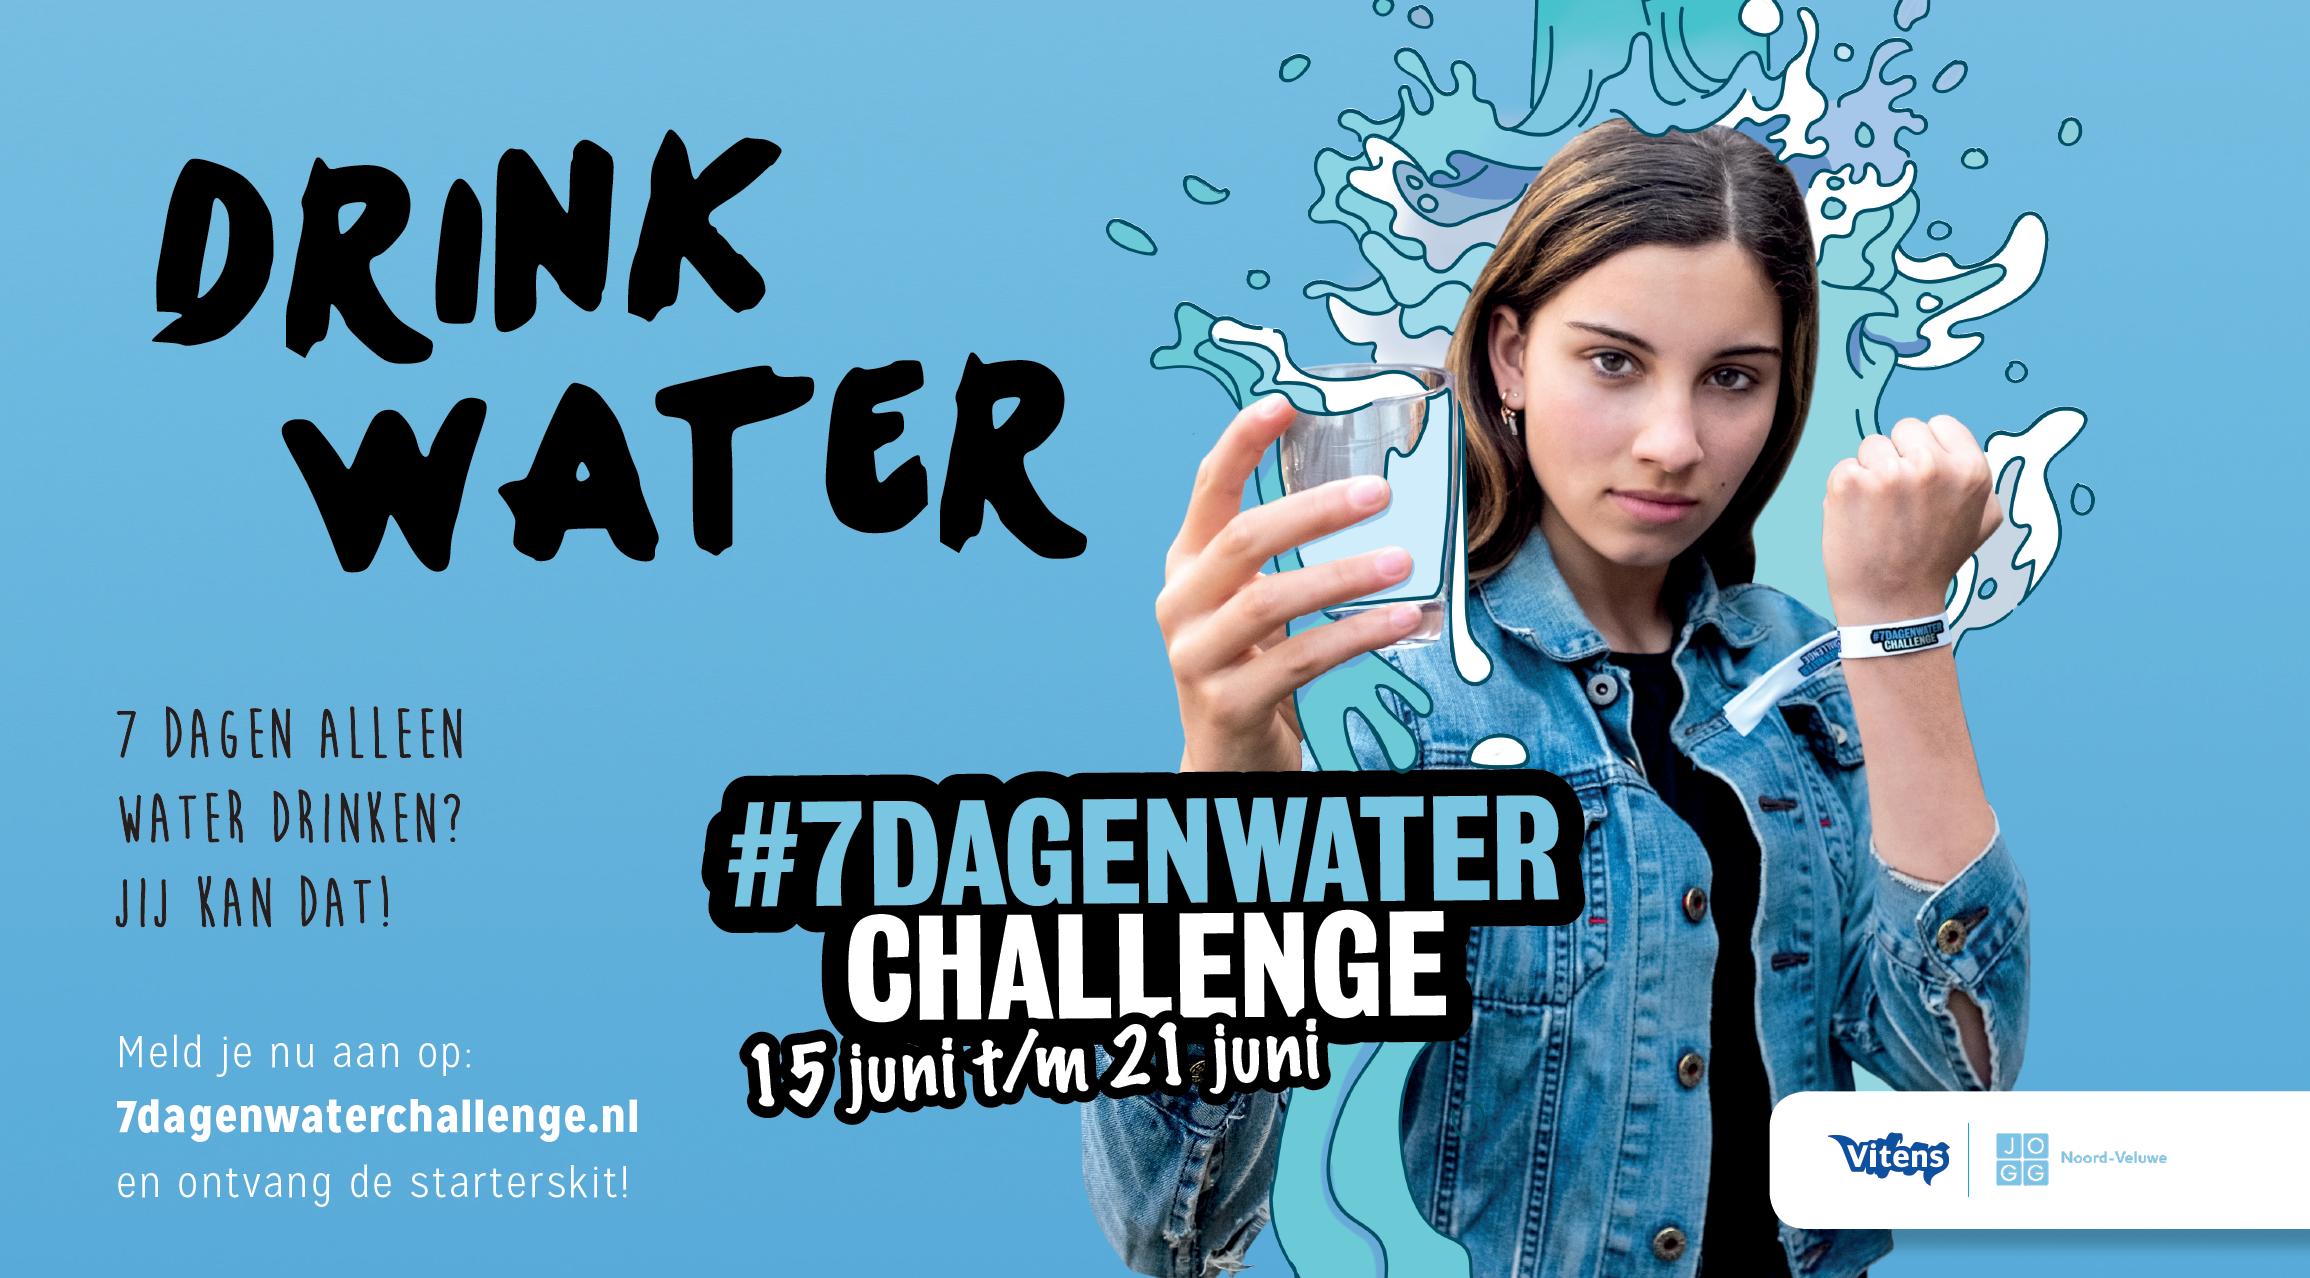 7dagenwater challenge!